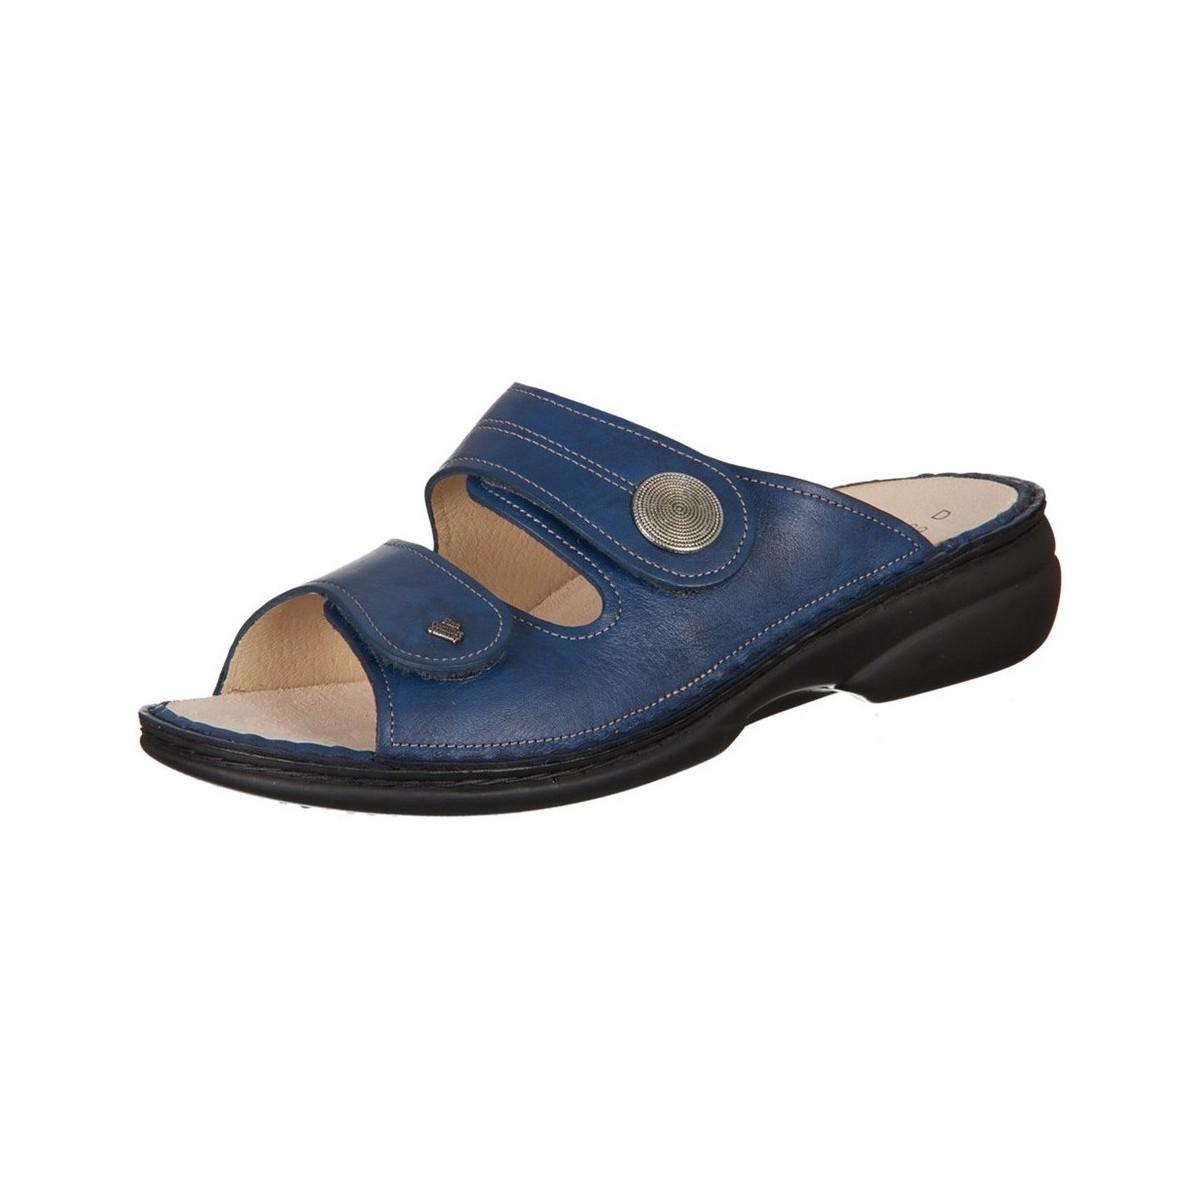 Finn Menorcasoft Nappaseda women's Mules / Casual Shoes in Discount 100% Original PIqF1If7zf